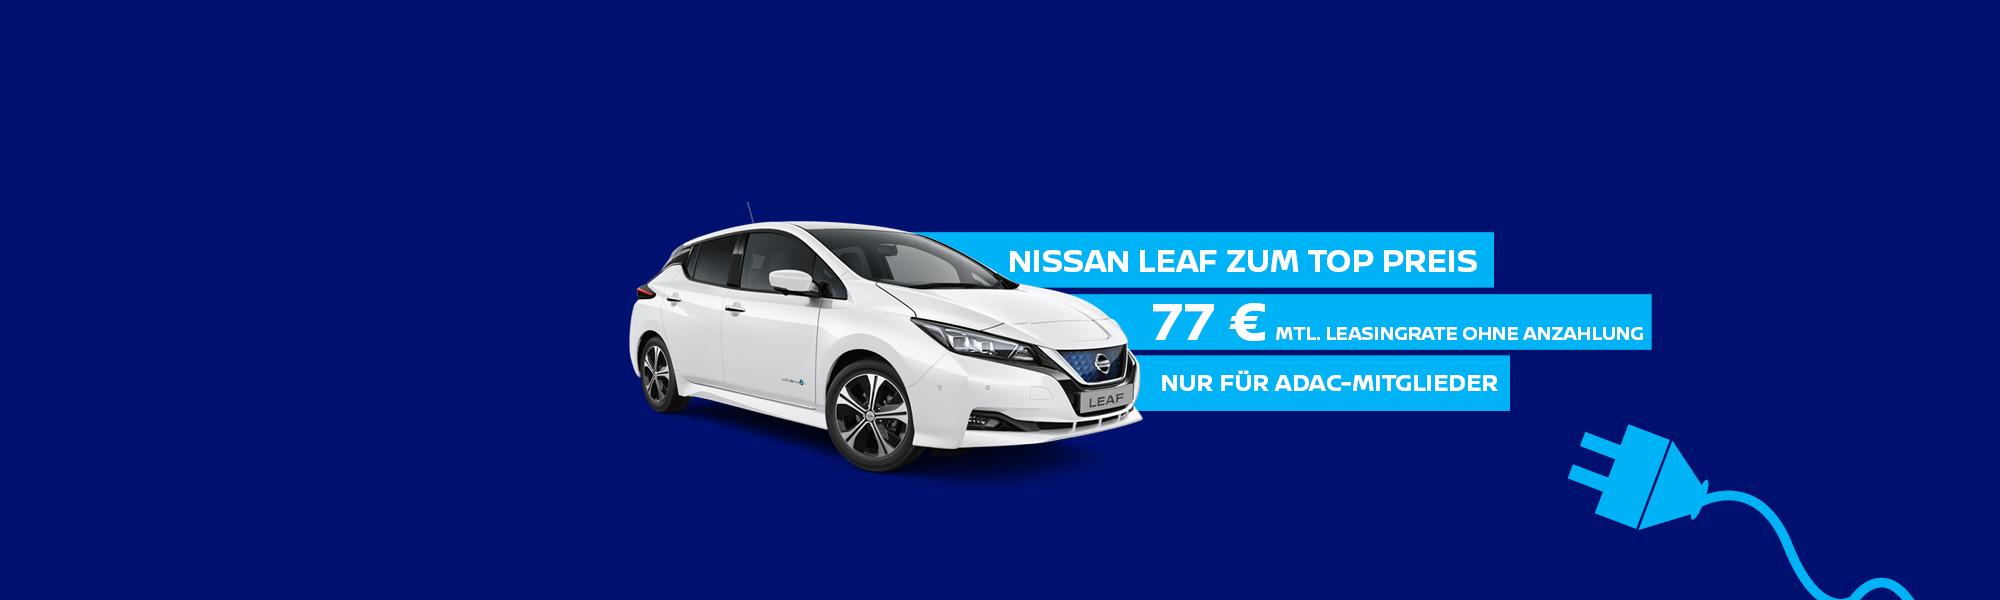 NISSAN LEAF – ZUM TOP PREIS!